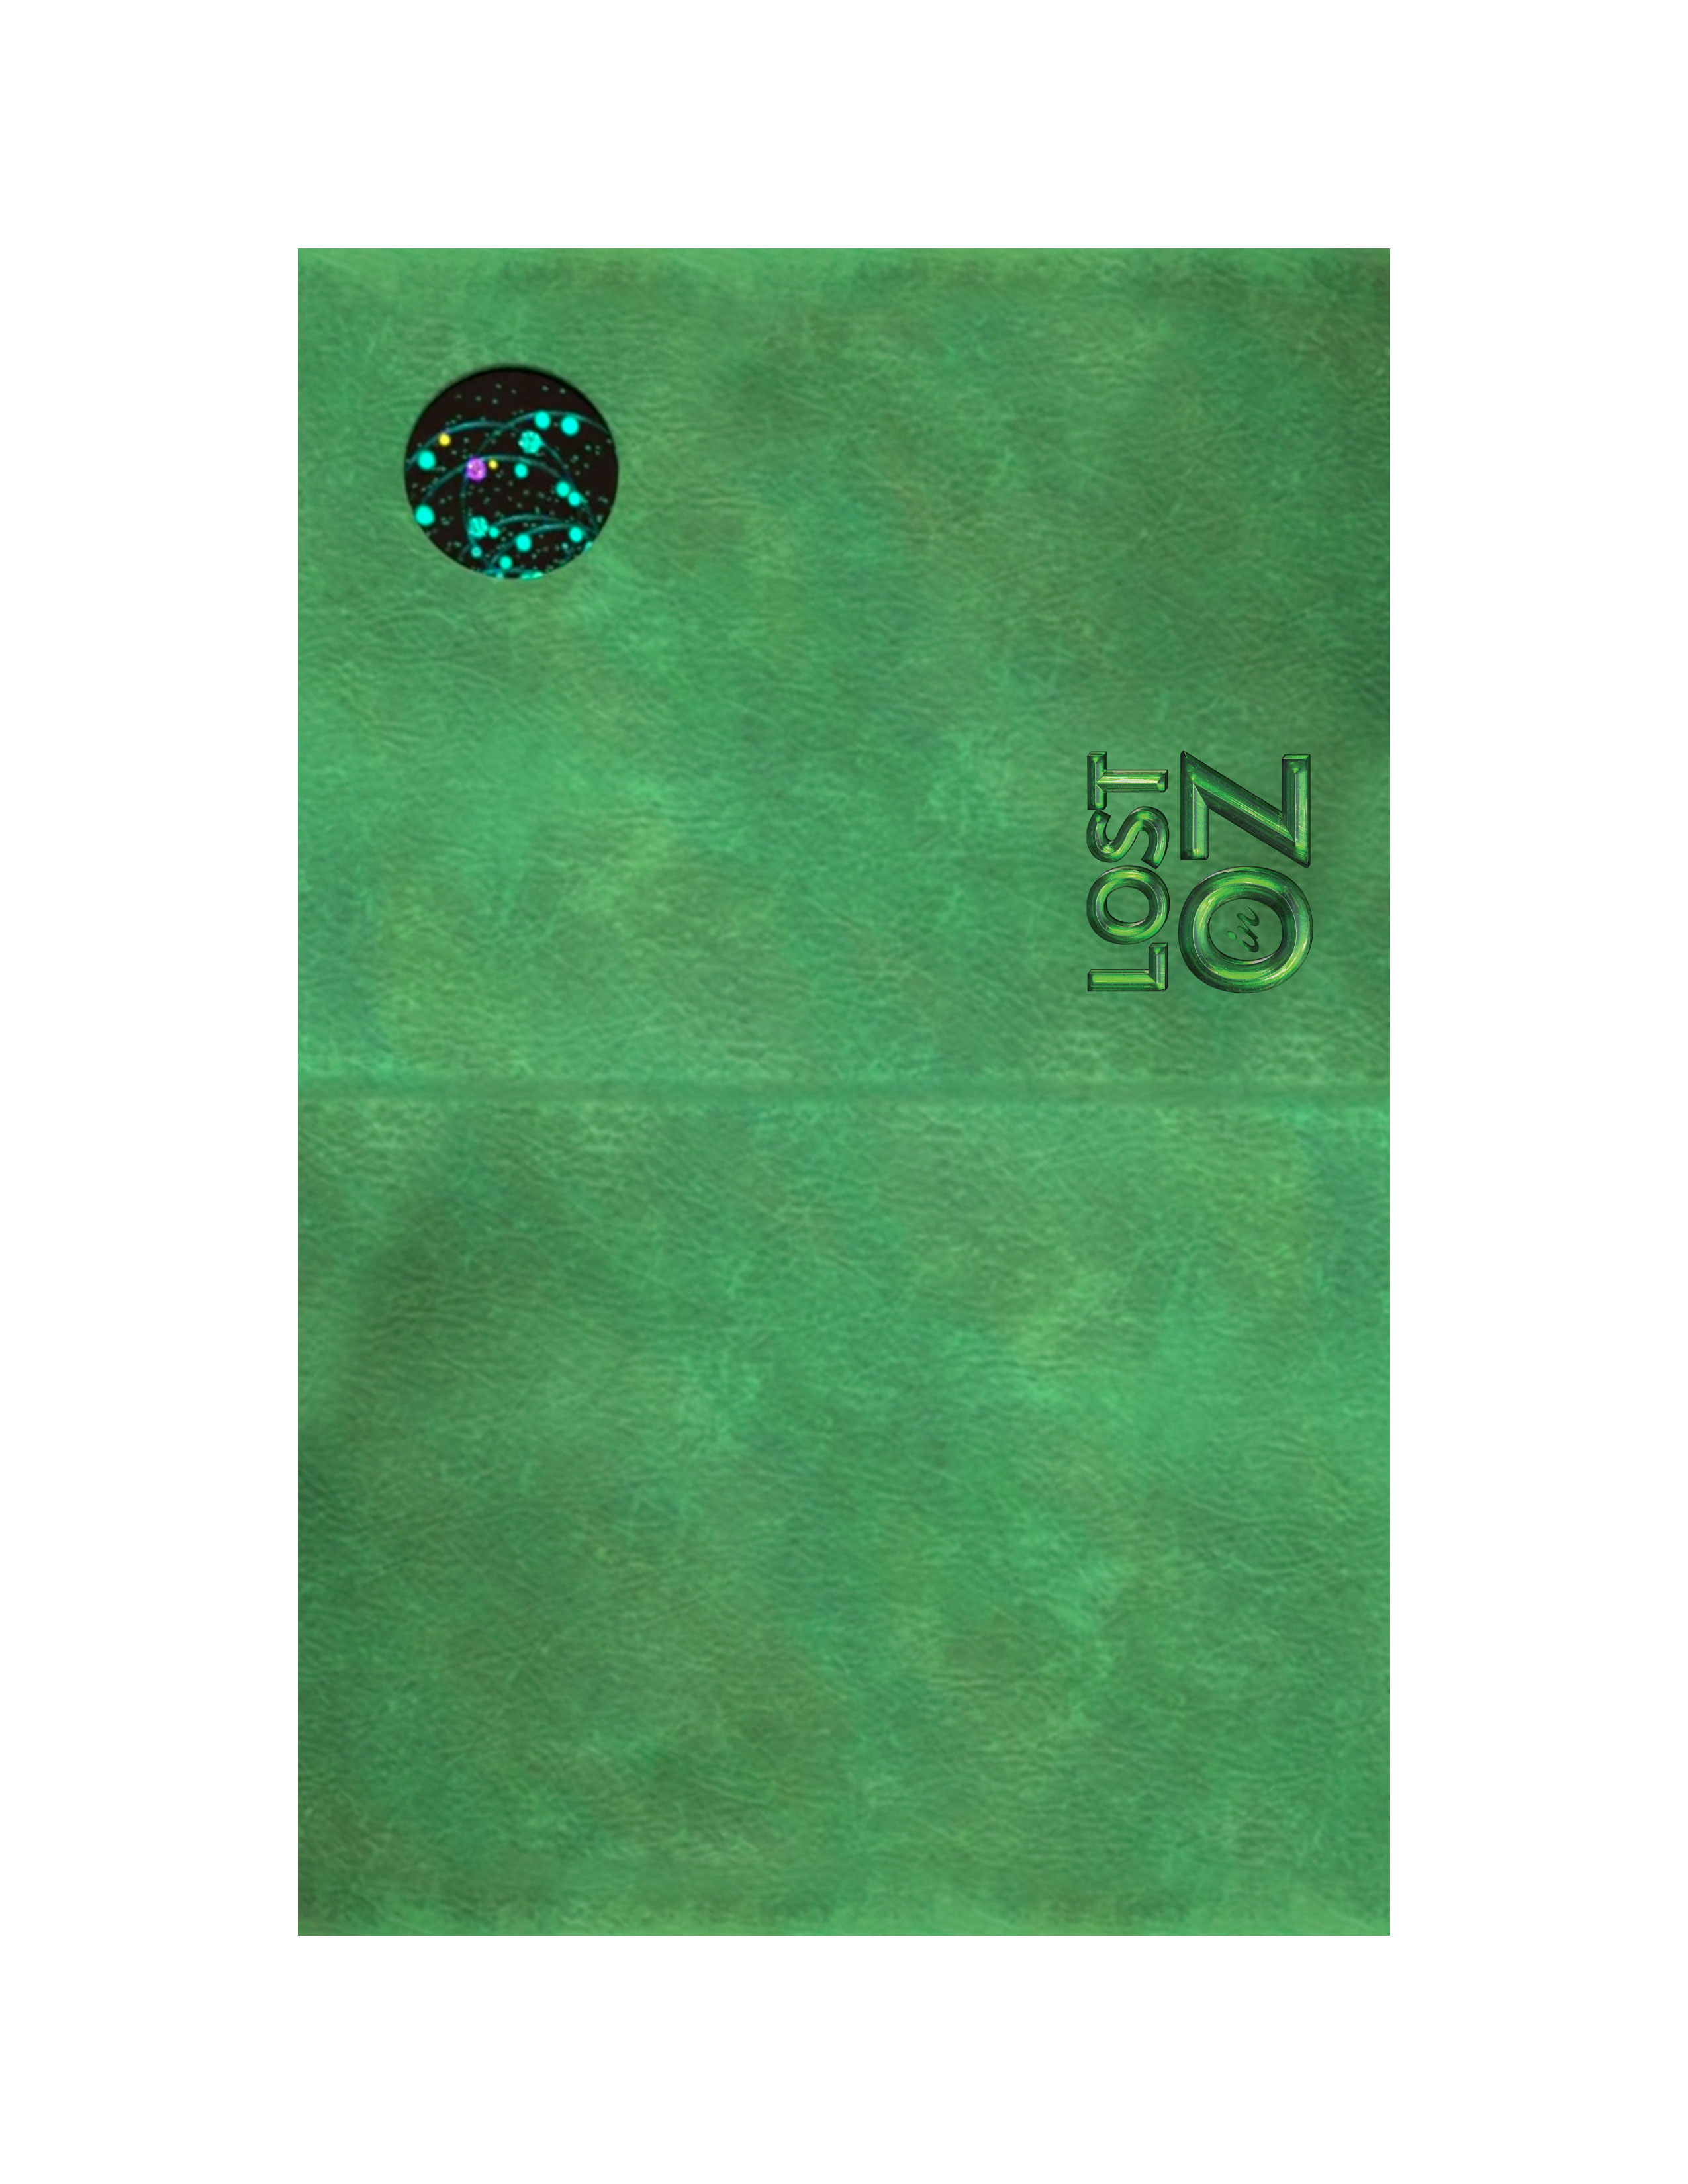 Scrapbook Cover Bureau Of Magic